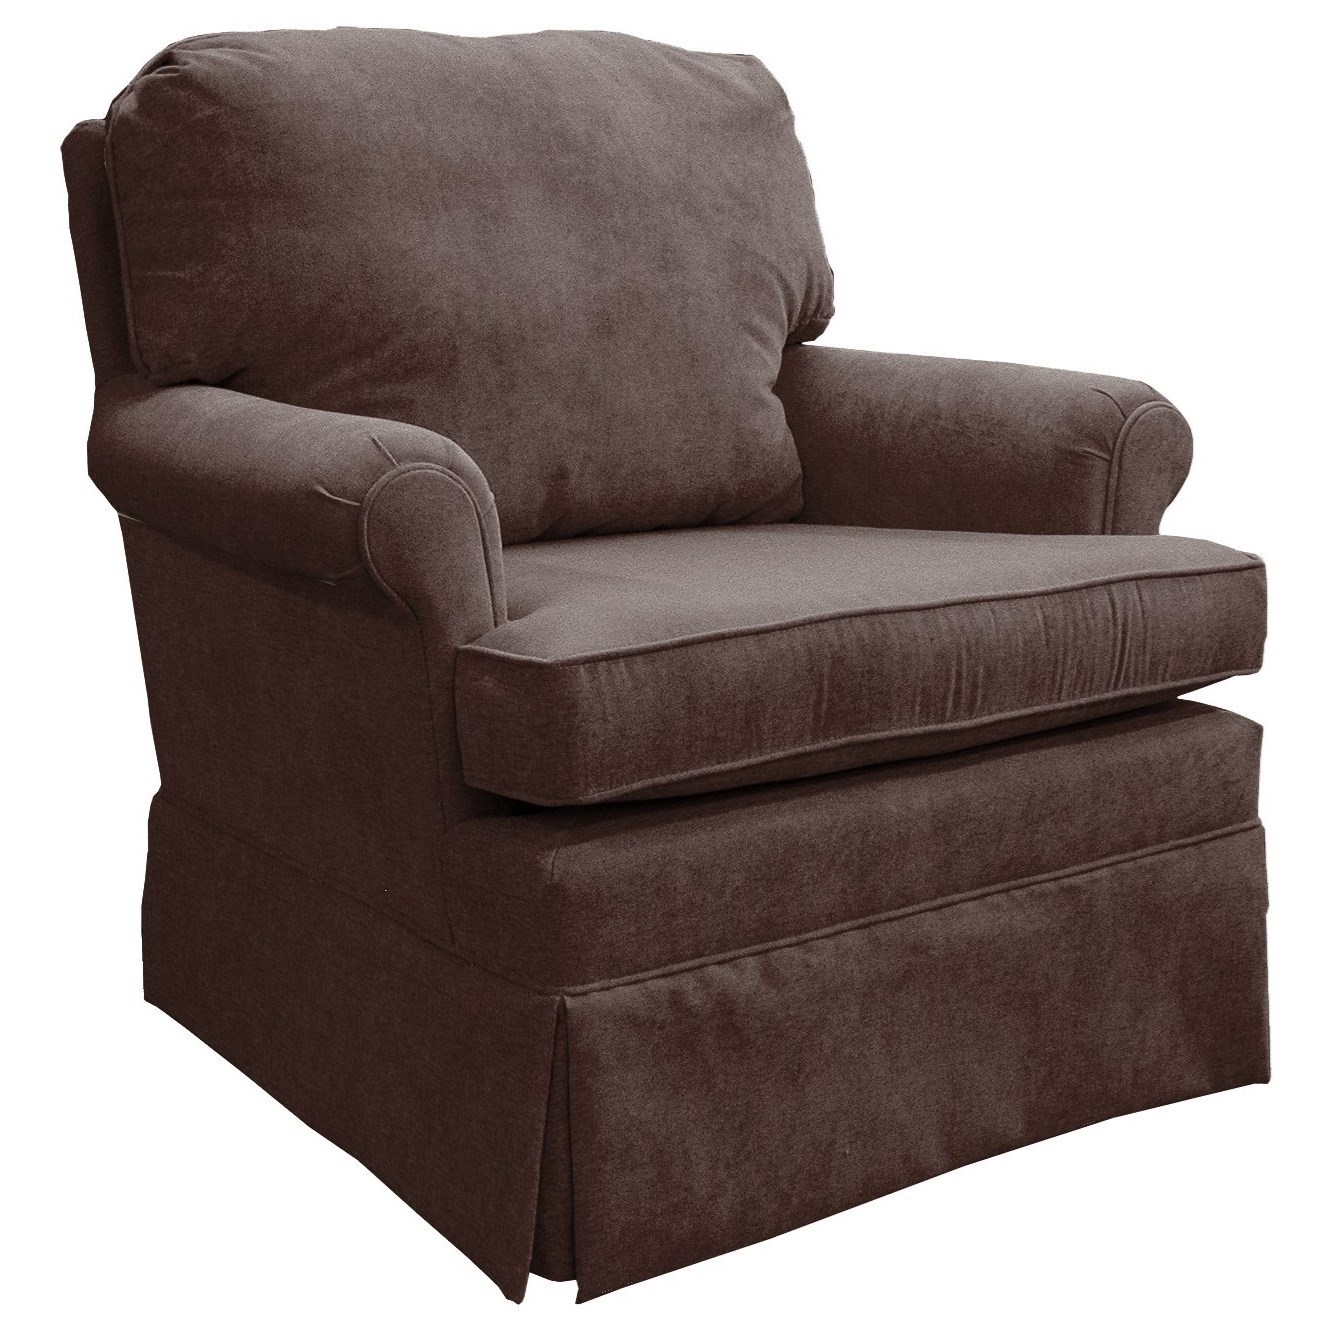 Best Home Furnishings Patoka Glider Club Chair - Item Number: 2616-23168C